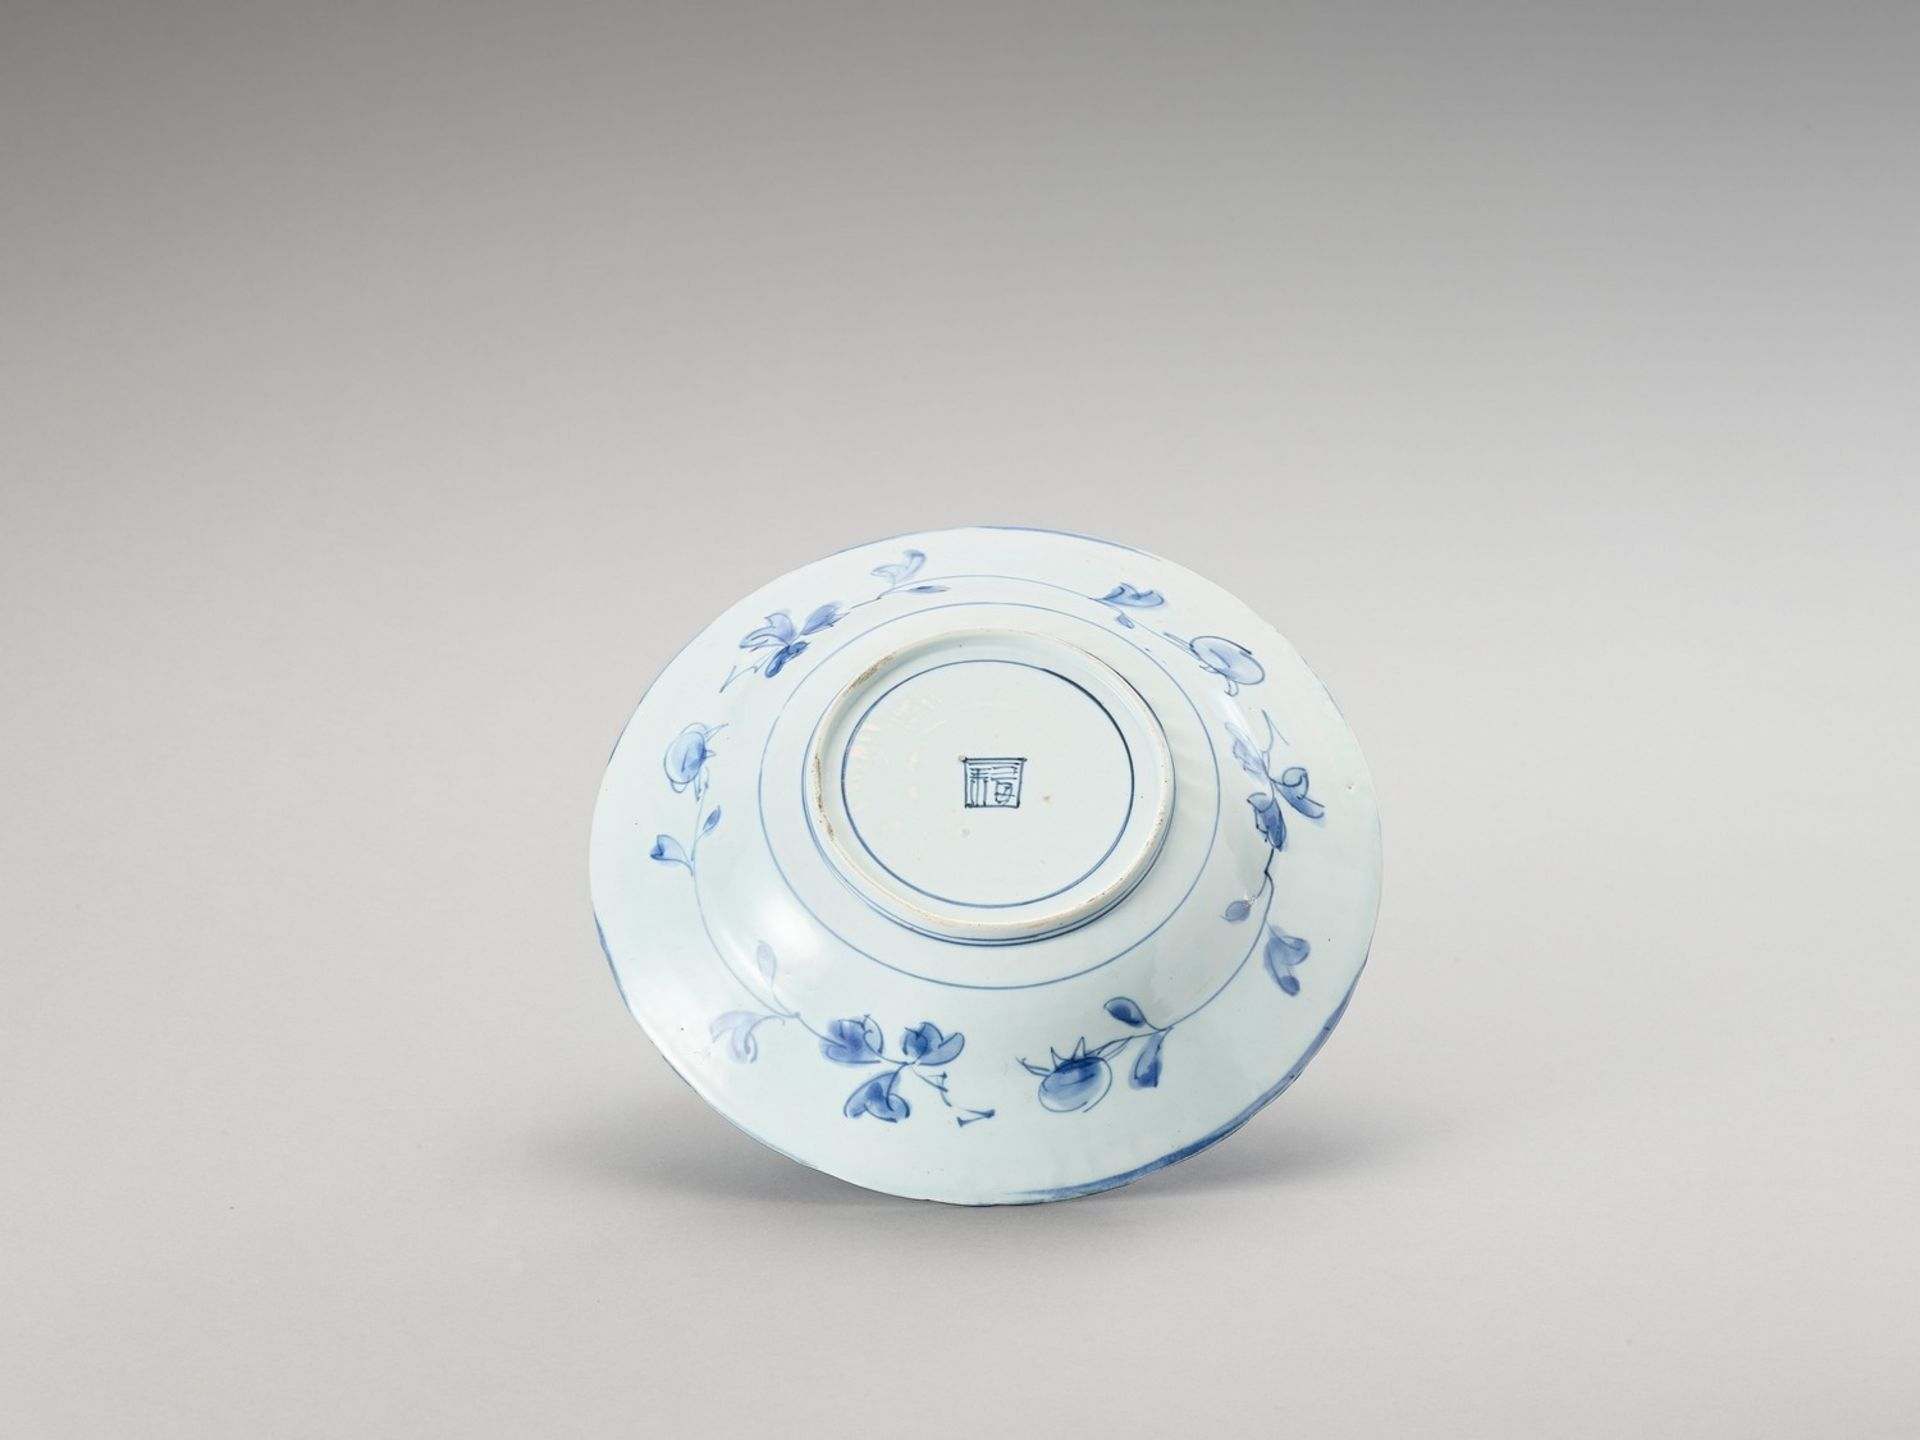 A BLUE AND WHITE PORCELAIN DISH - Bild 3 aus 4